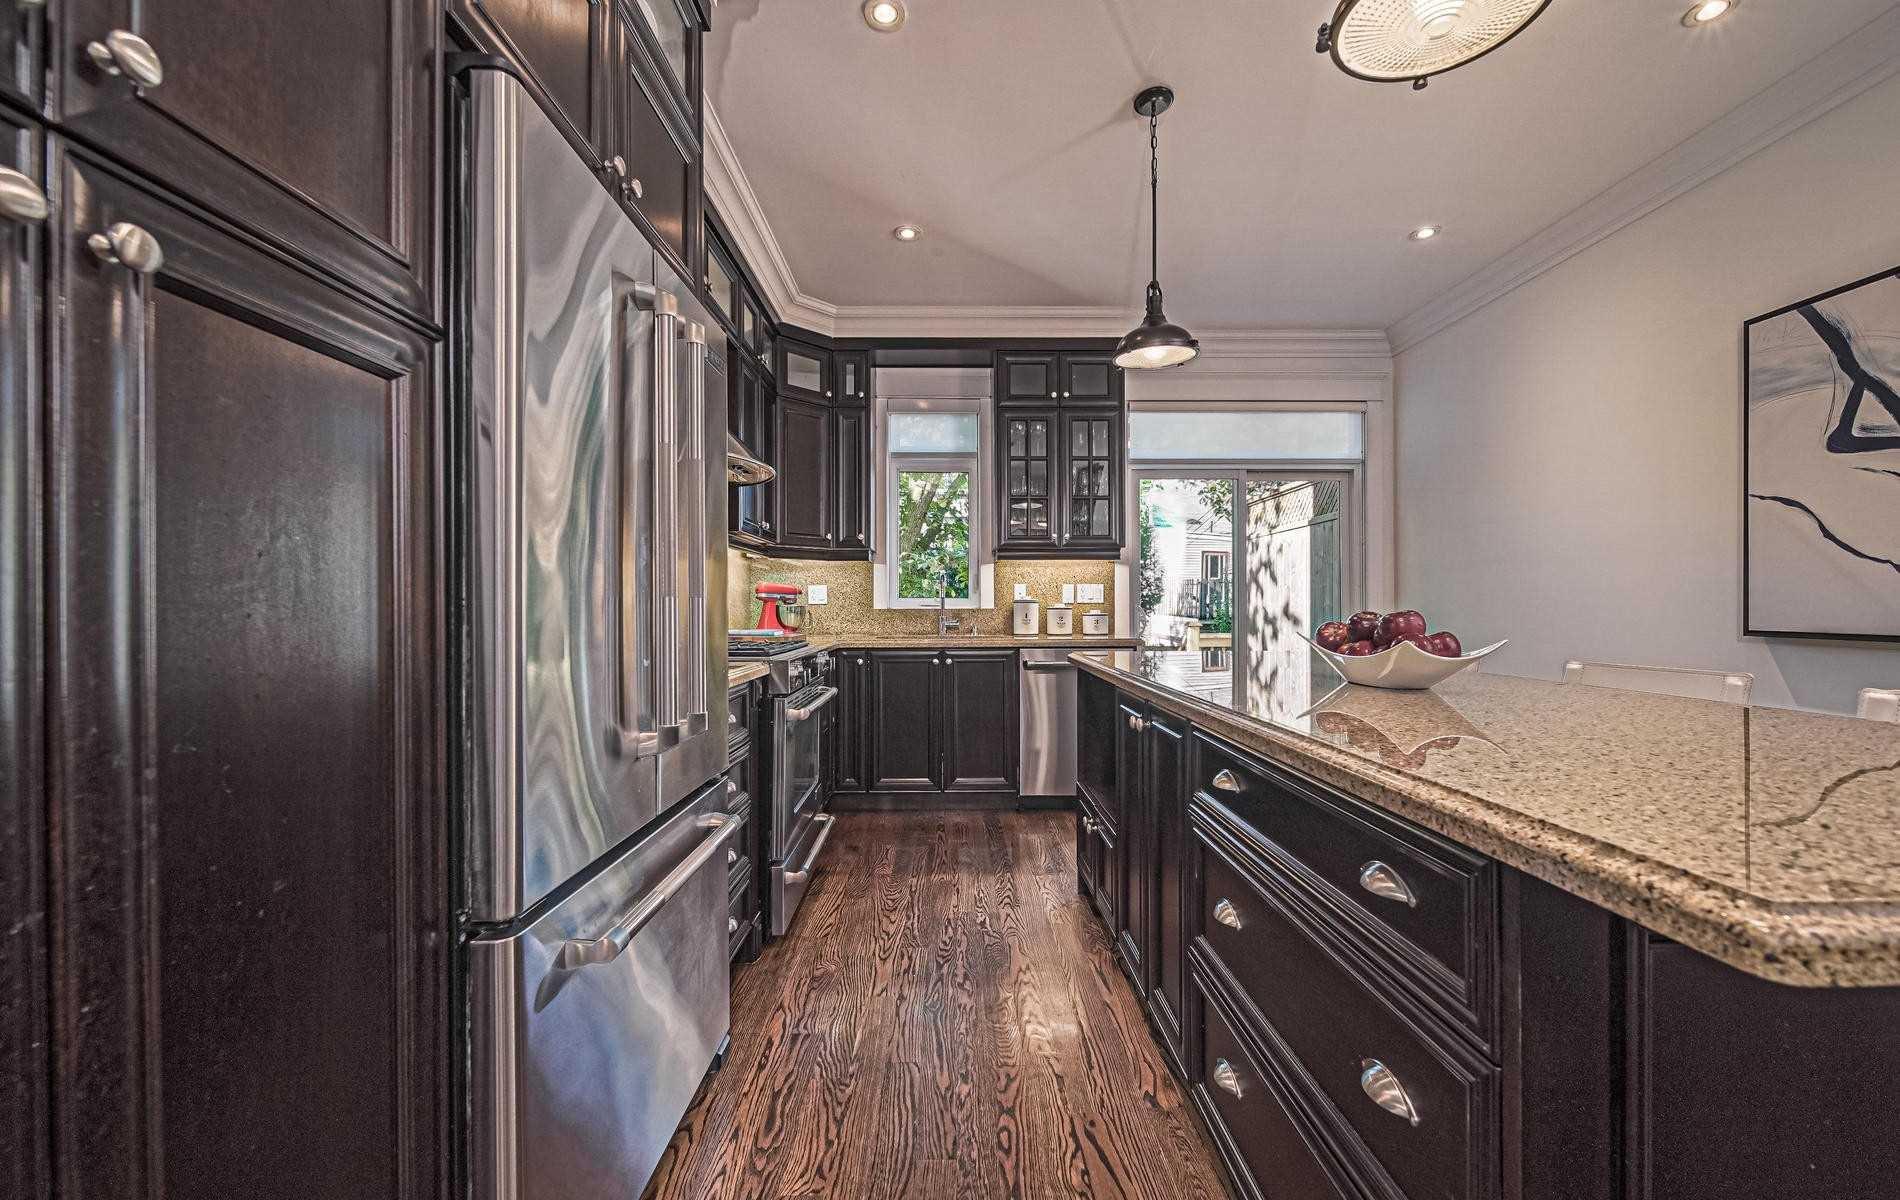 Photo 6: Photos: 216A Hamilton Street in Toronto: South Riverdale House (3-Storey) for sale (Toronto E01)  : MLS®# E4619870